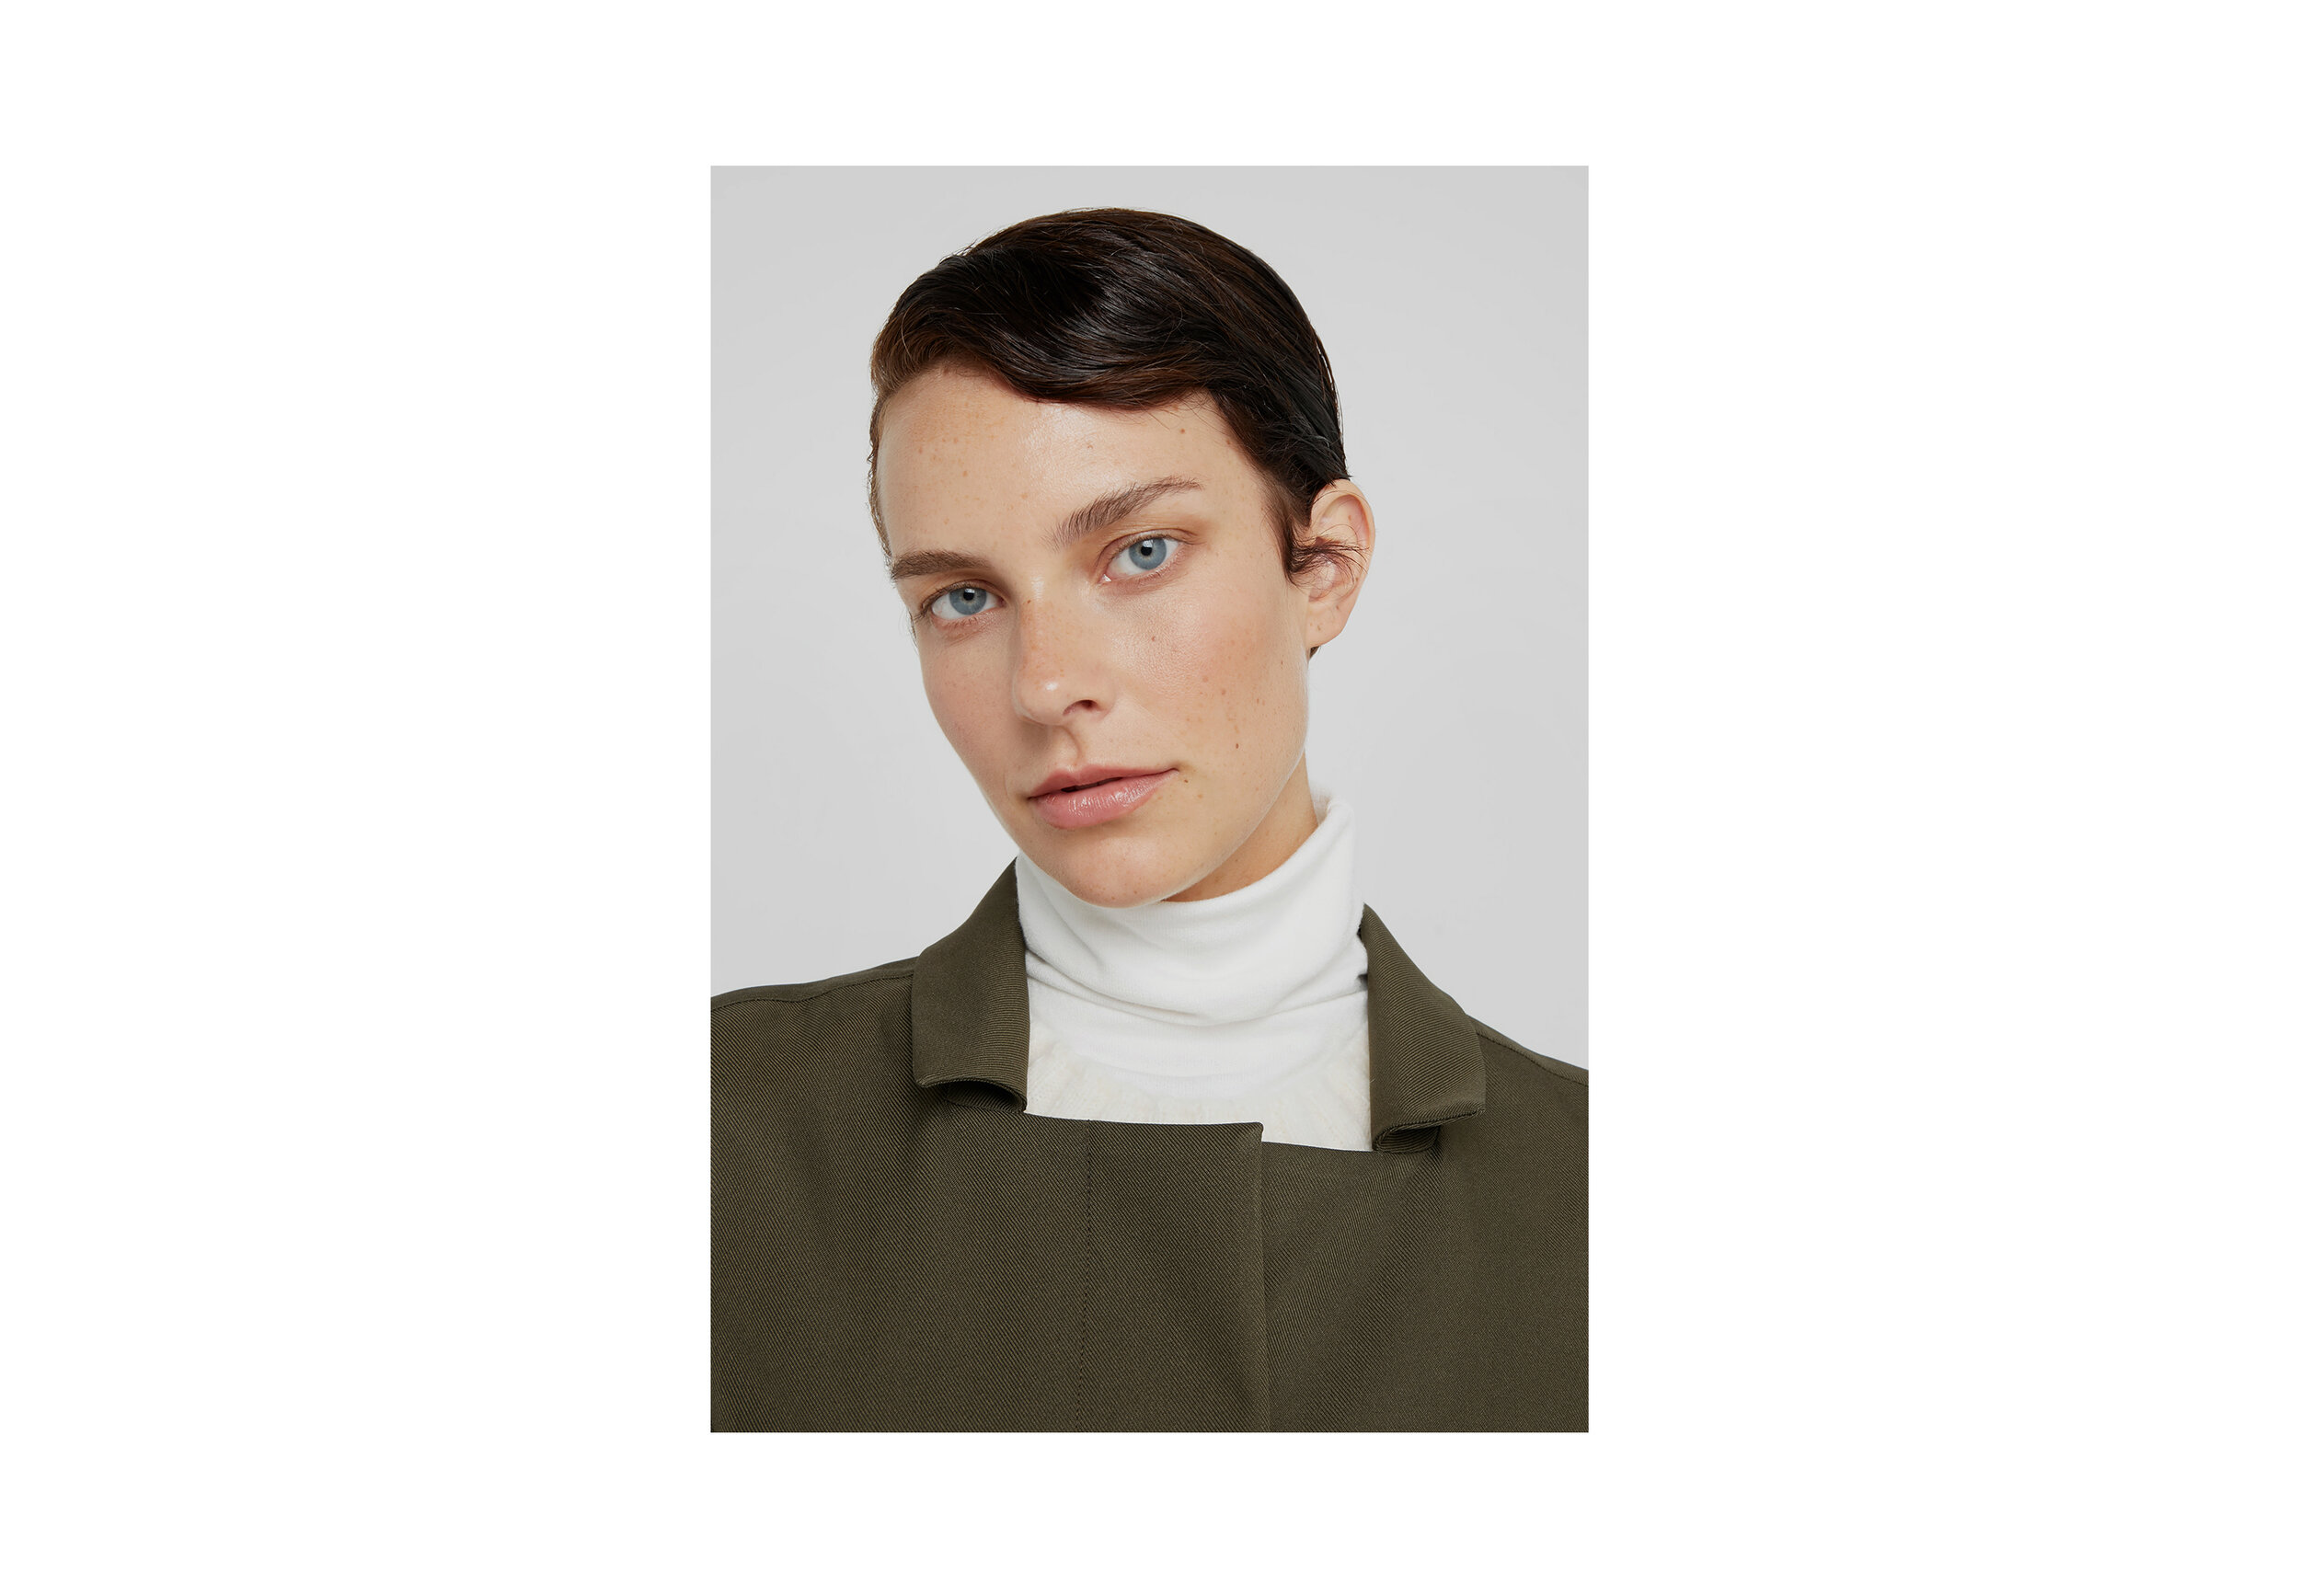 Naomi-Zalando-Fashion-Matthew-Coleman-Photography-1.jpg